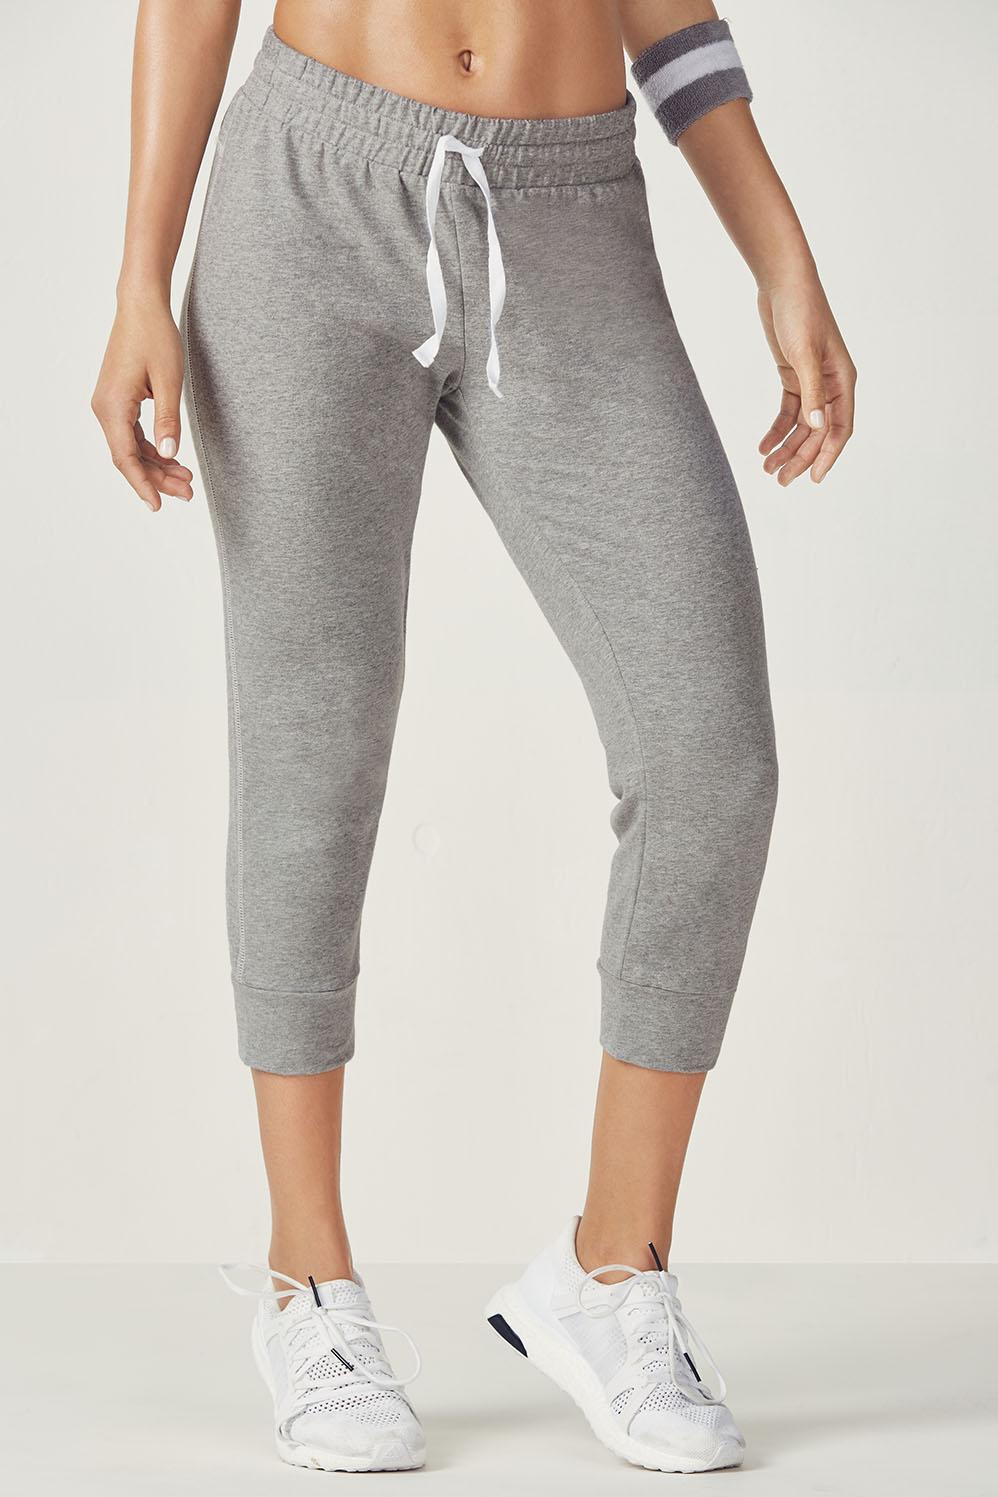 Fabletics Capri Miriam Jogger Pants Womens Gray Size S